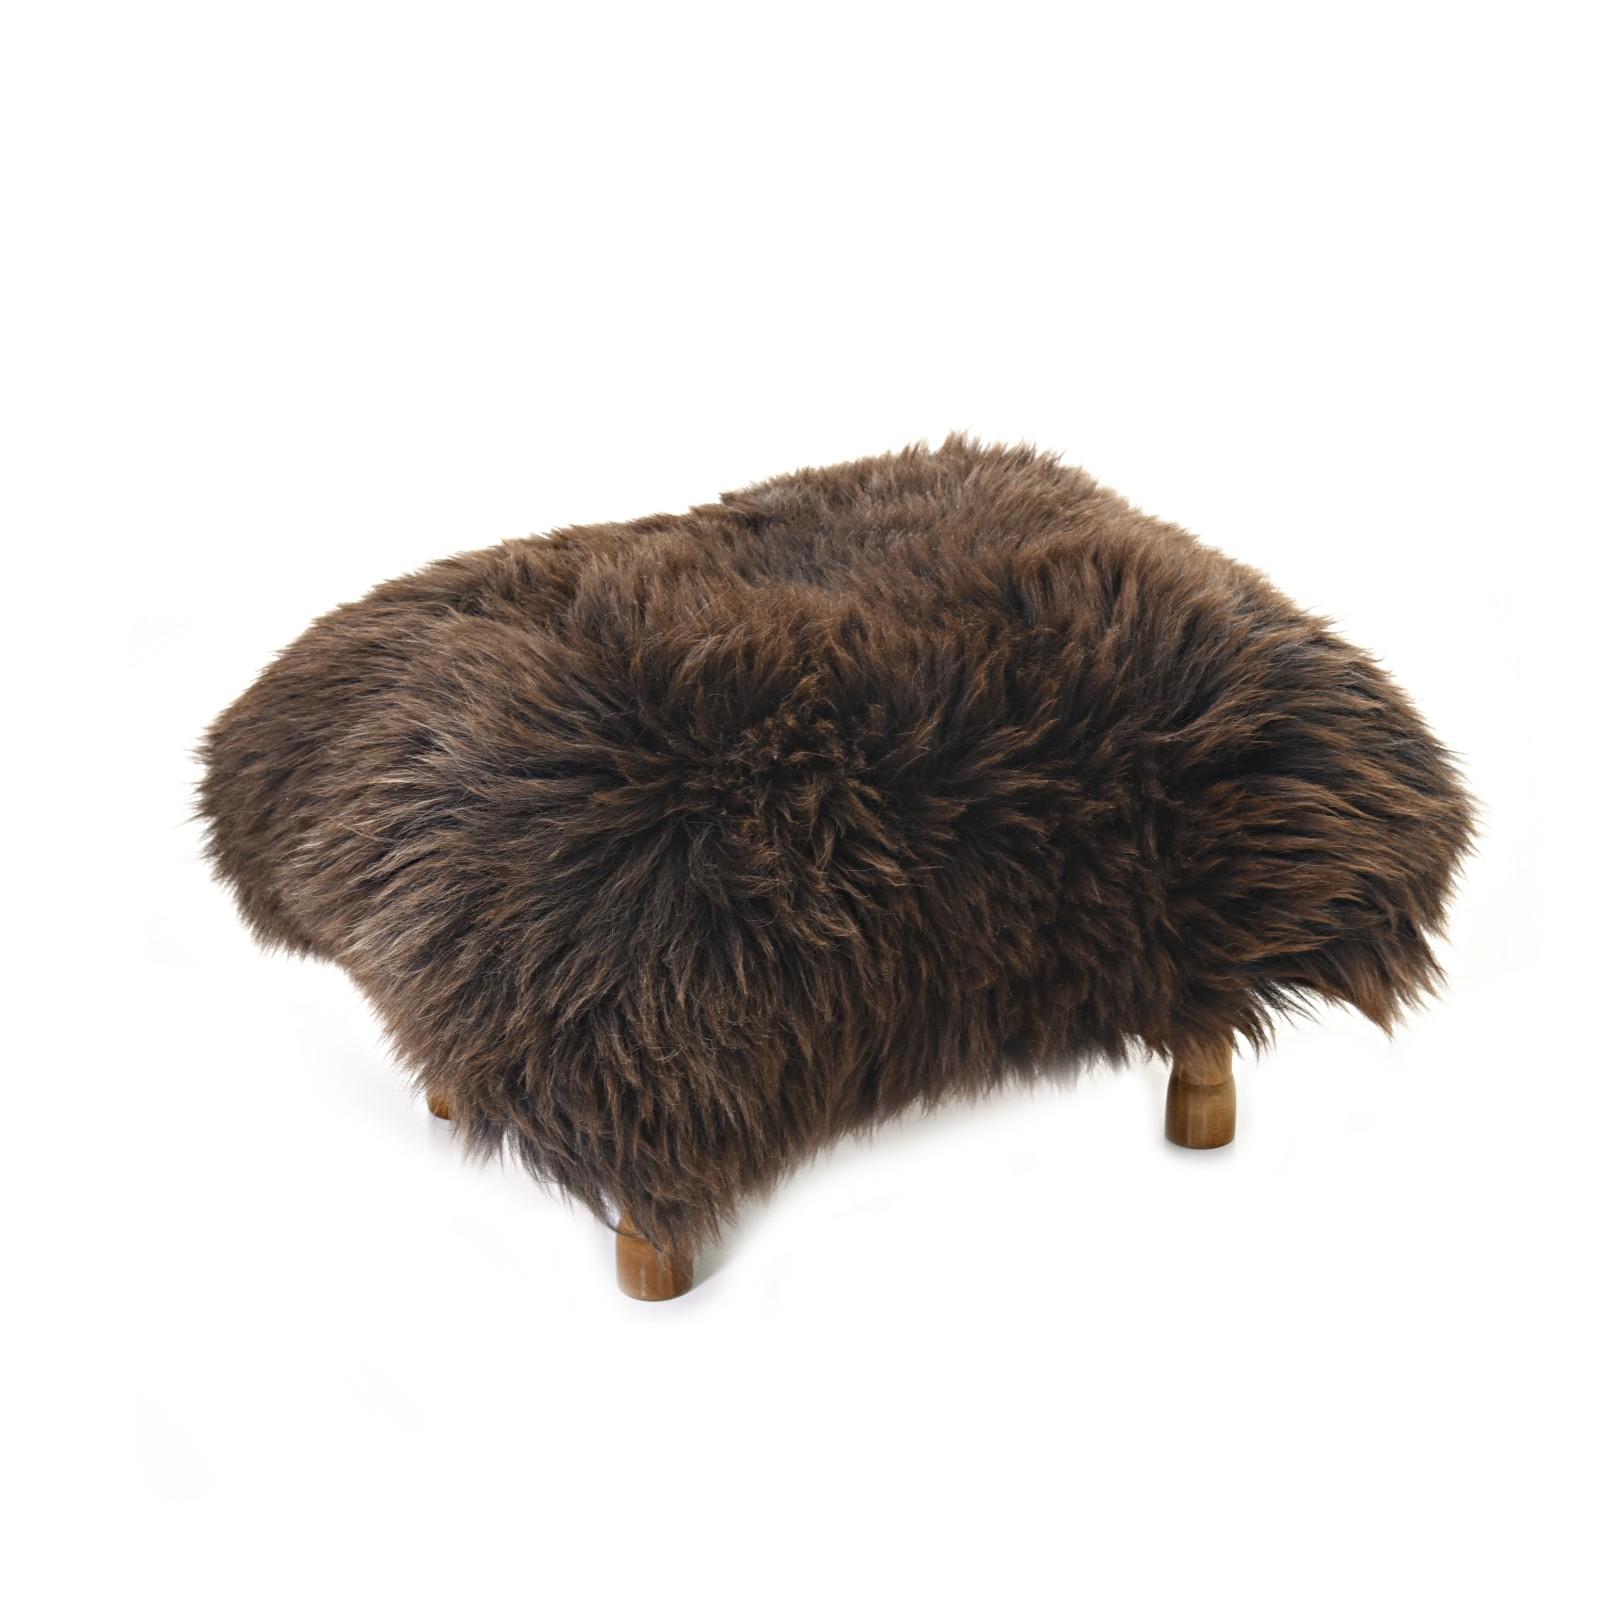 Delyth Sheepskin Footstool Chocolate Brown